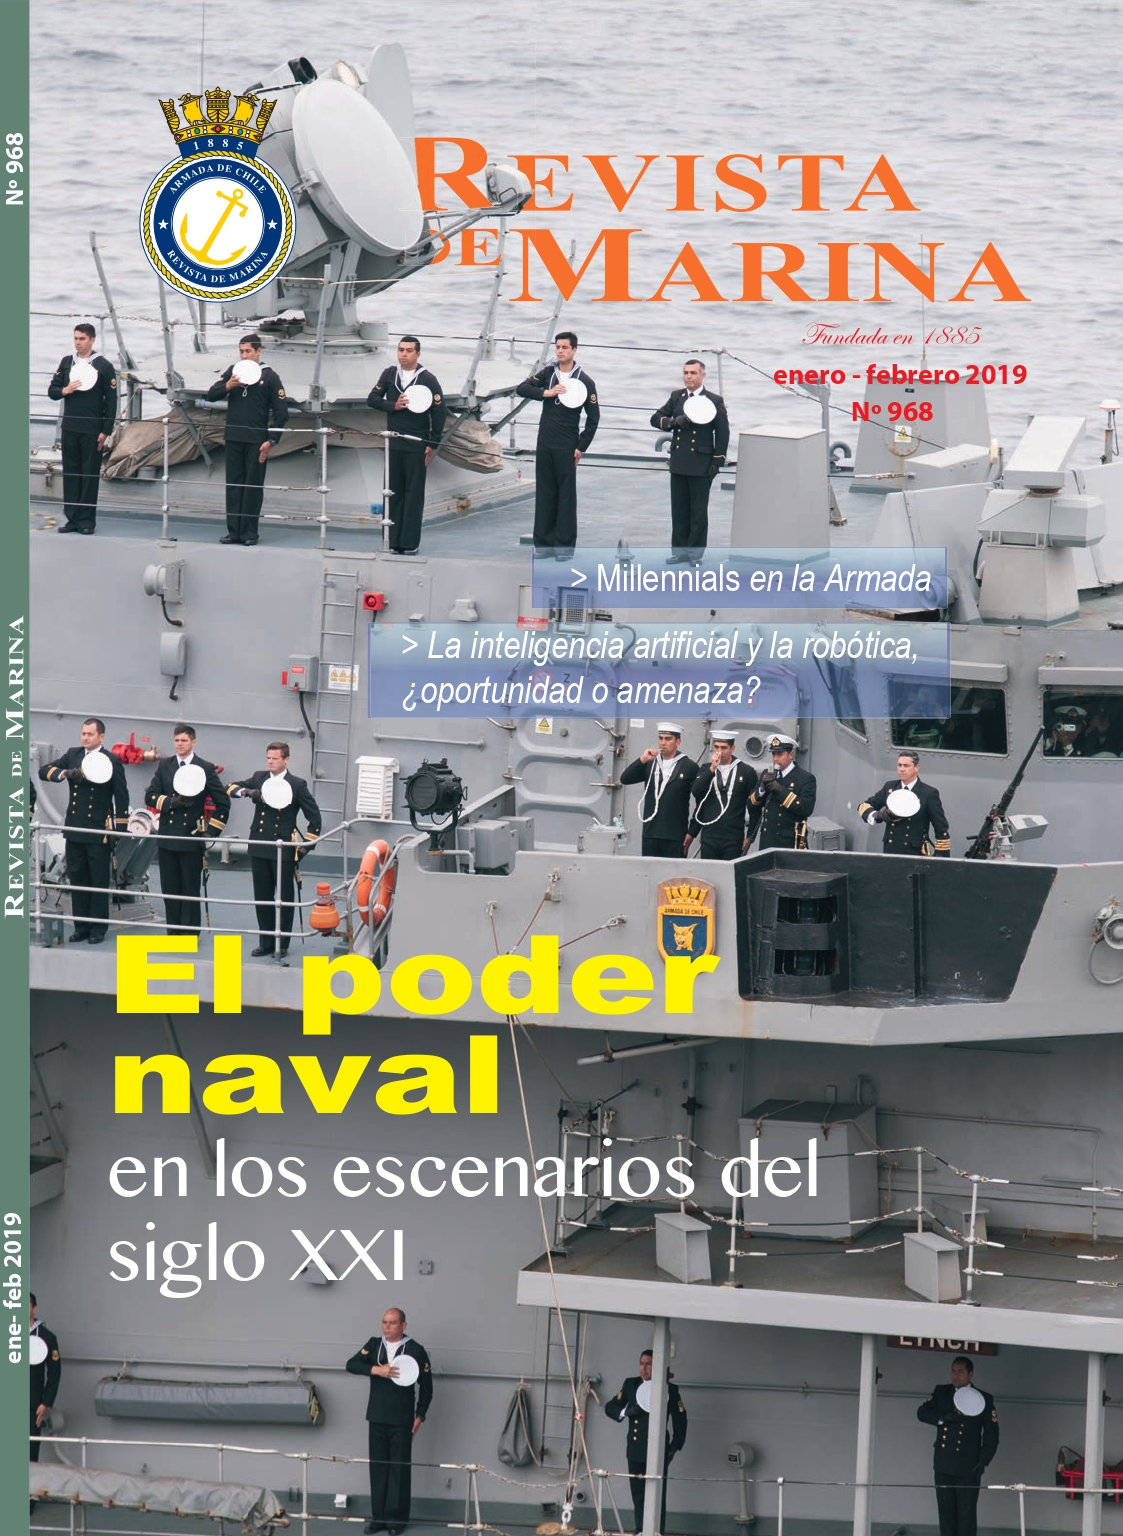 Última edición: Año CXXXIV, Volumen 136, Número 968